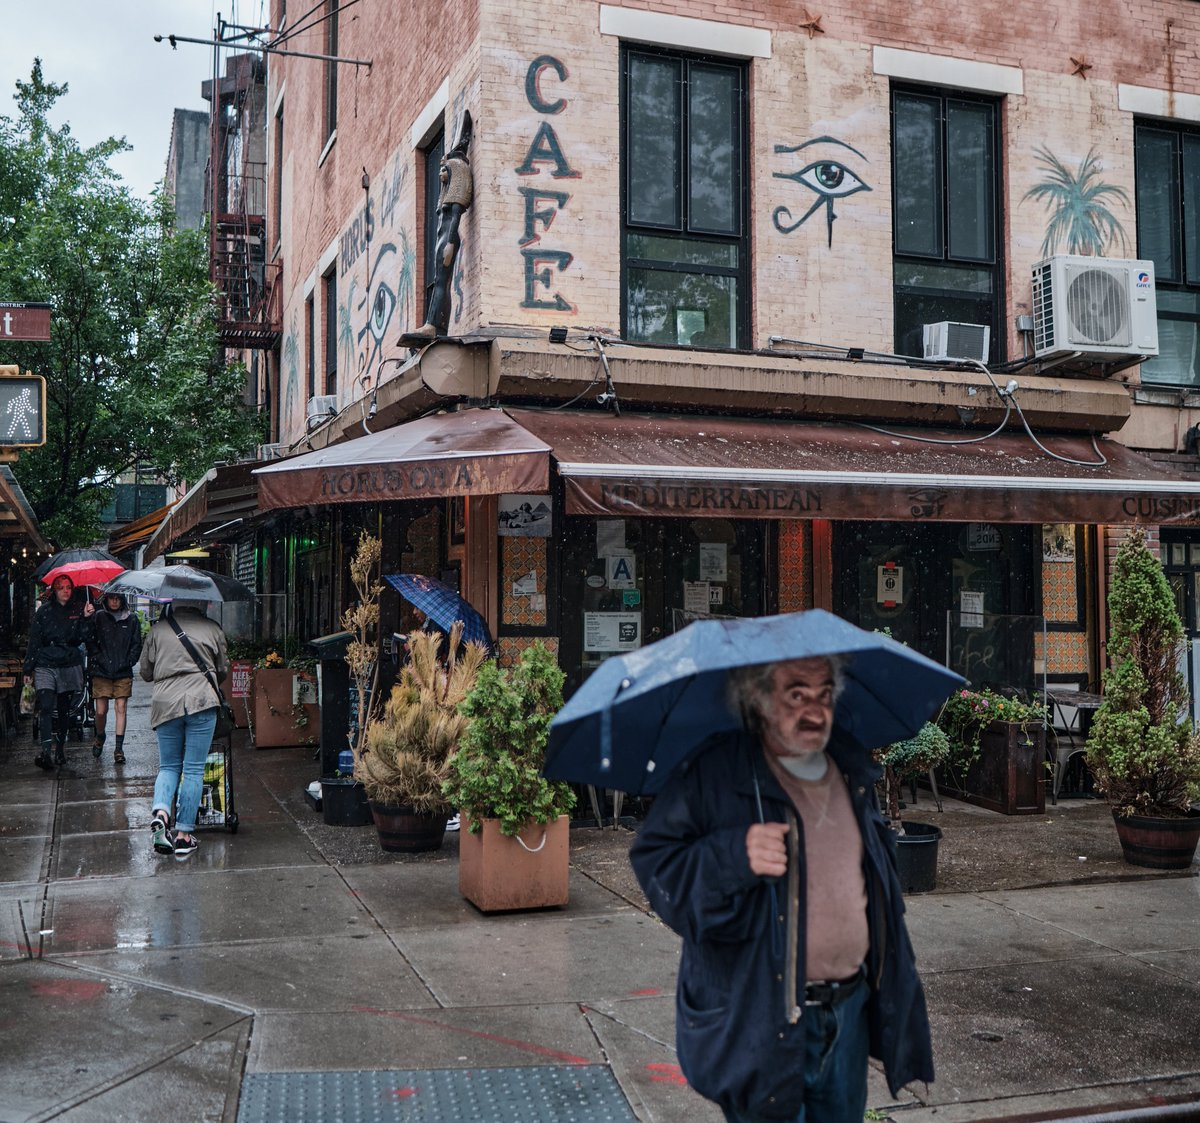 Another Rainy Day in the City... #nyc #eastvillage #cityliving #citylife #rainyday #umbrellashots #street #streetlife #reallife #socialphotographyissocialwork #streetvibes #relate #appreciate #communicate #makewonderfulphotographs #fujifilm #xpro3images #xpro3 https://t.co/H04cnpwaIr